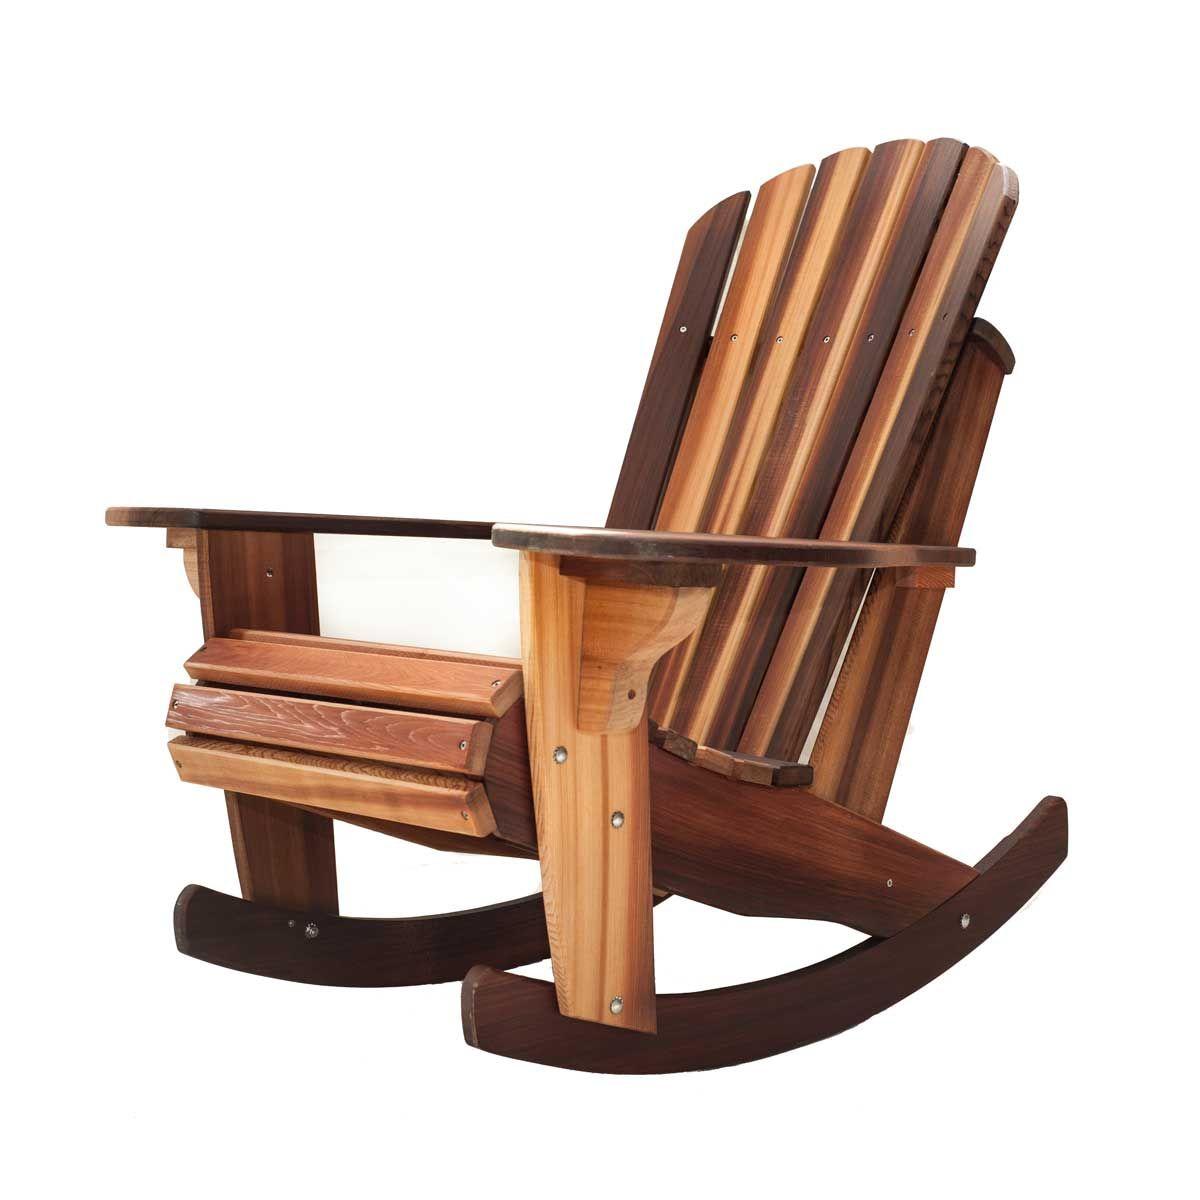 Adirondack Cedar Rocking Chair | Adirondack Chairs | Pinterest ...